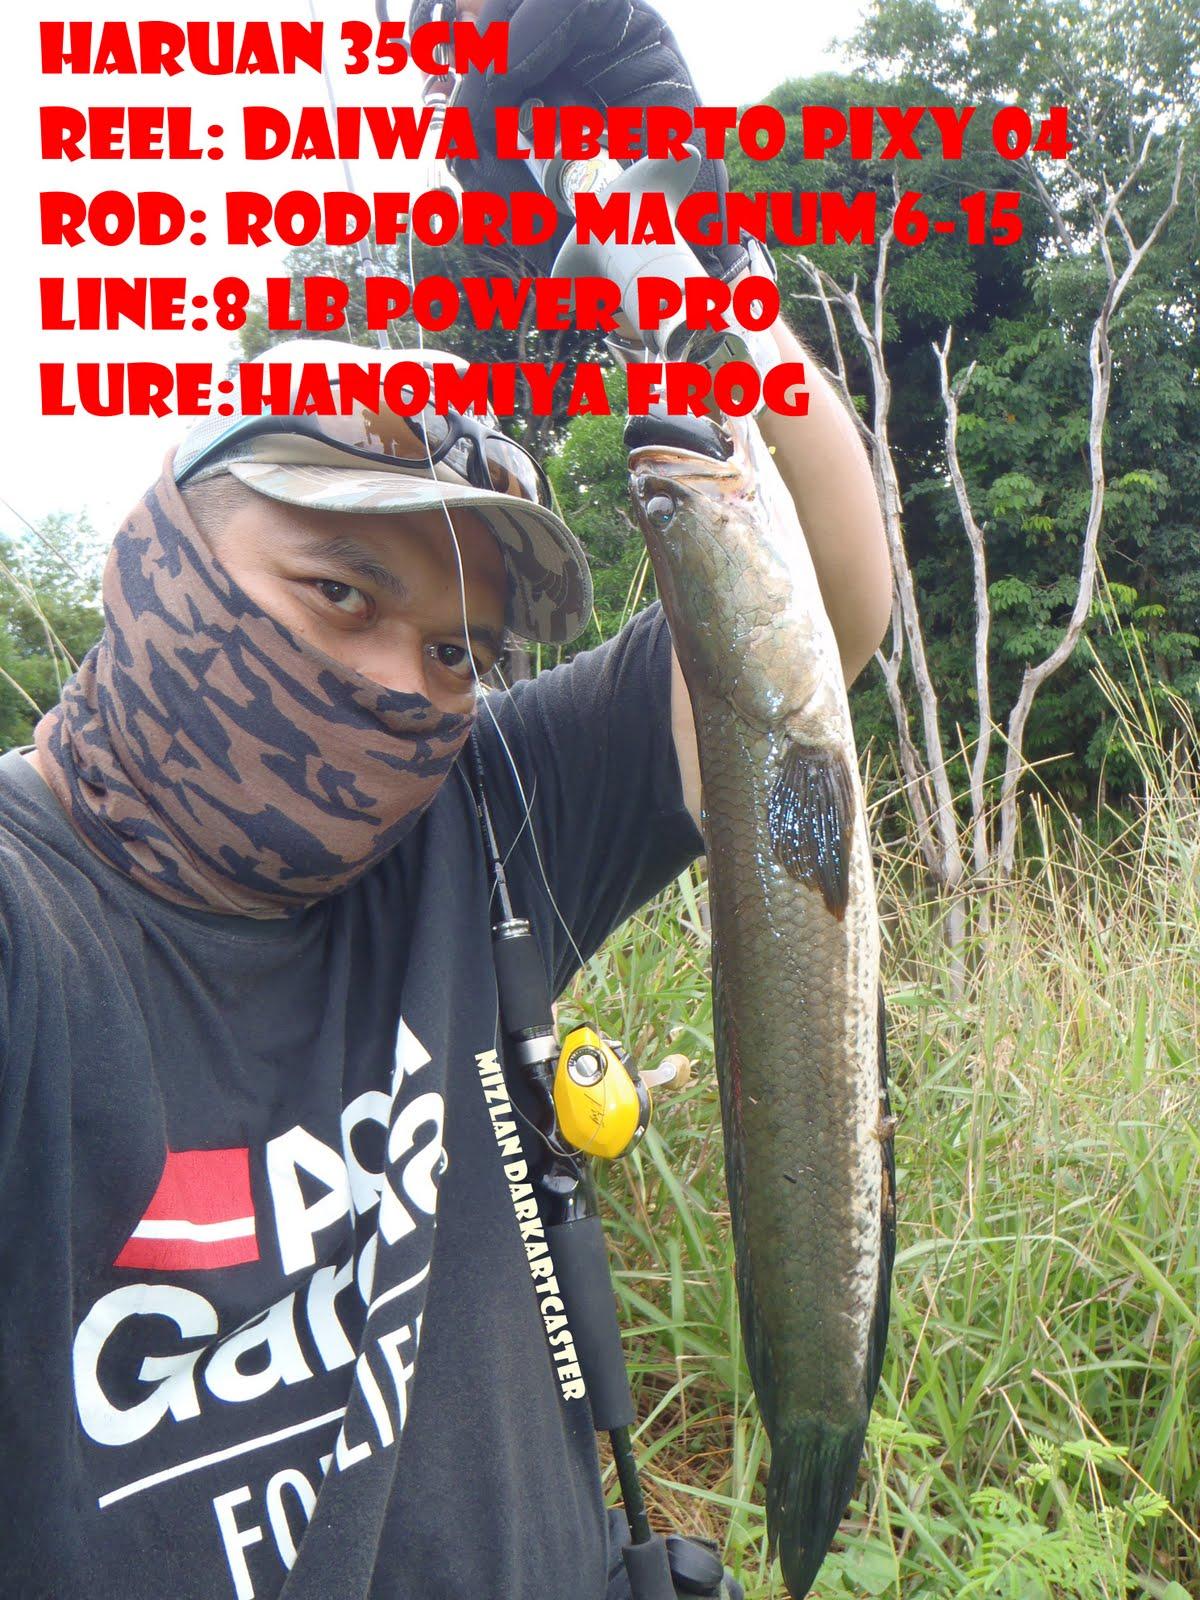 http://1.bp.blogspot.com/-bxrGa19n5qk/TpkH6GYhJfI/AAAAAAAAG_Q/tmQSlPfPY-U/s1600/4.JPG